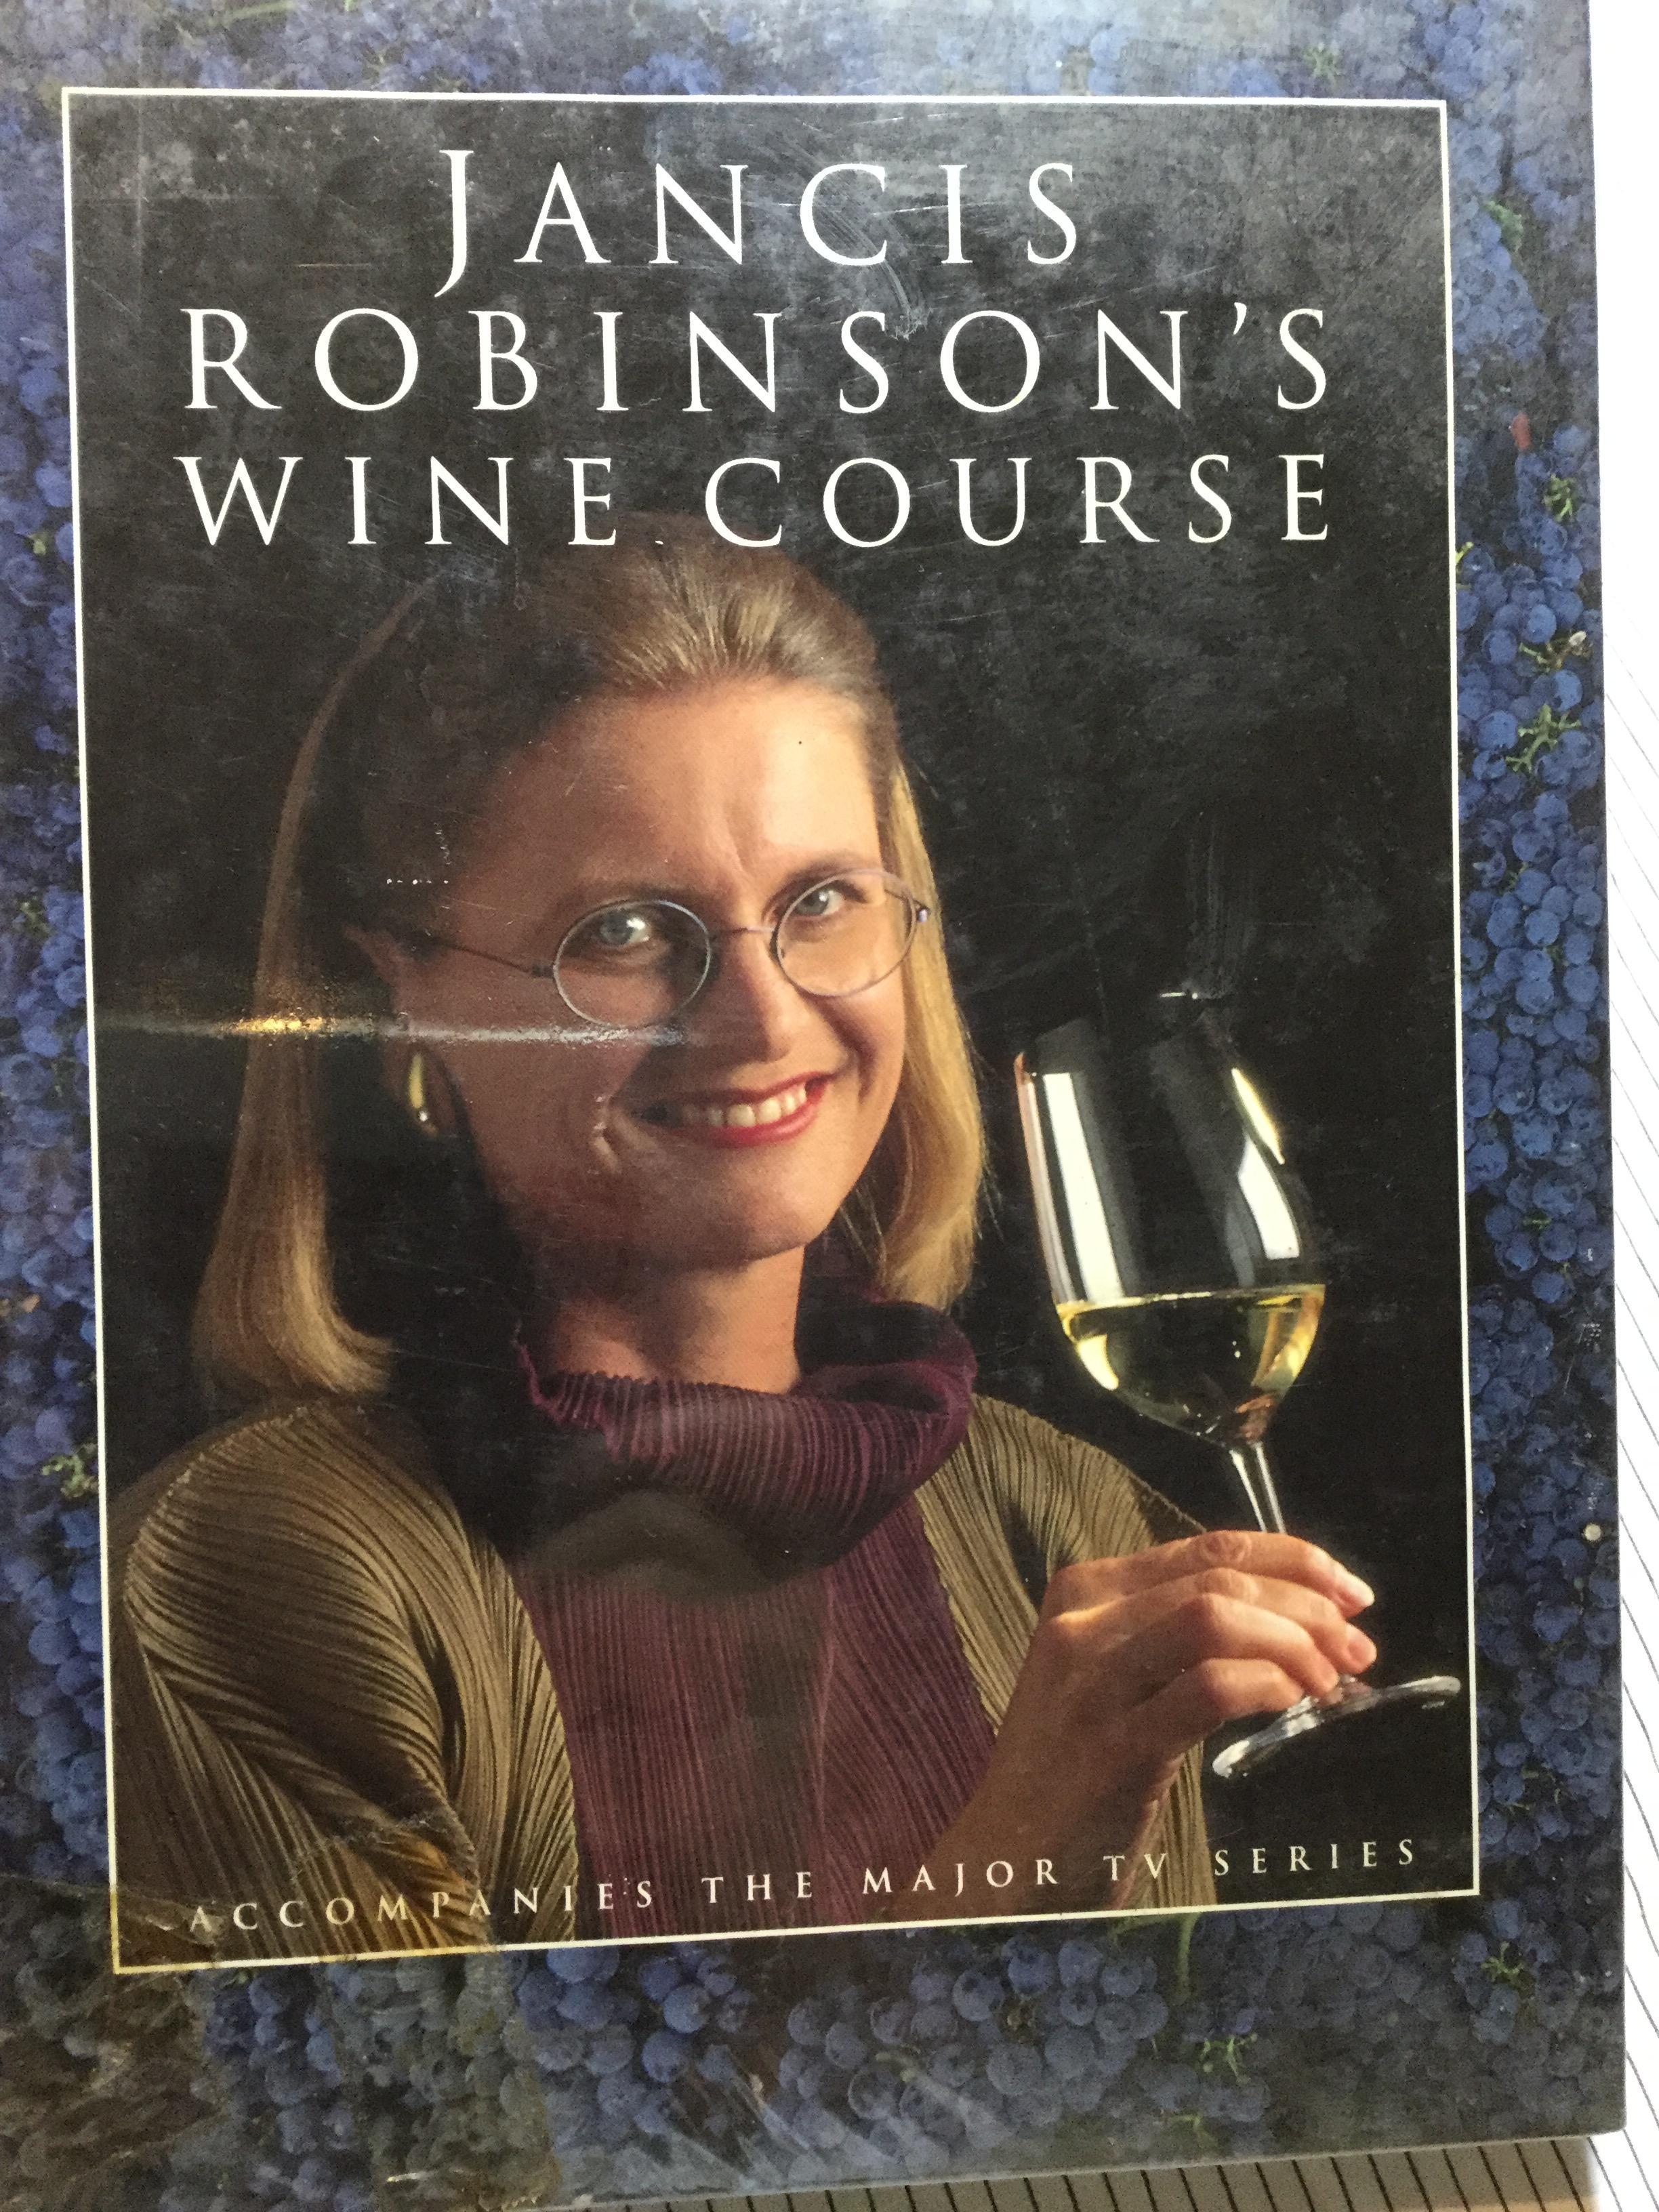 JANCIS ROBINSON'S WINE COURSE.